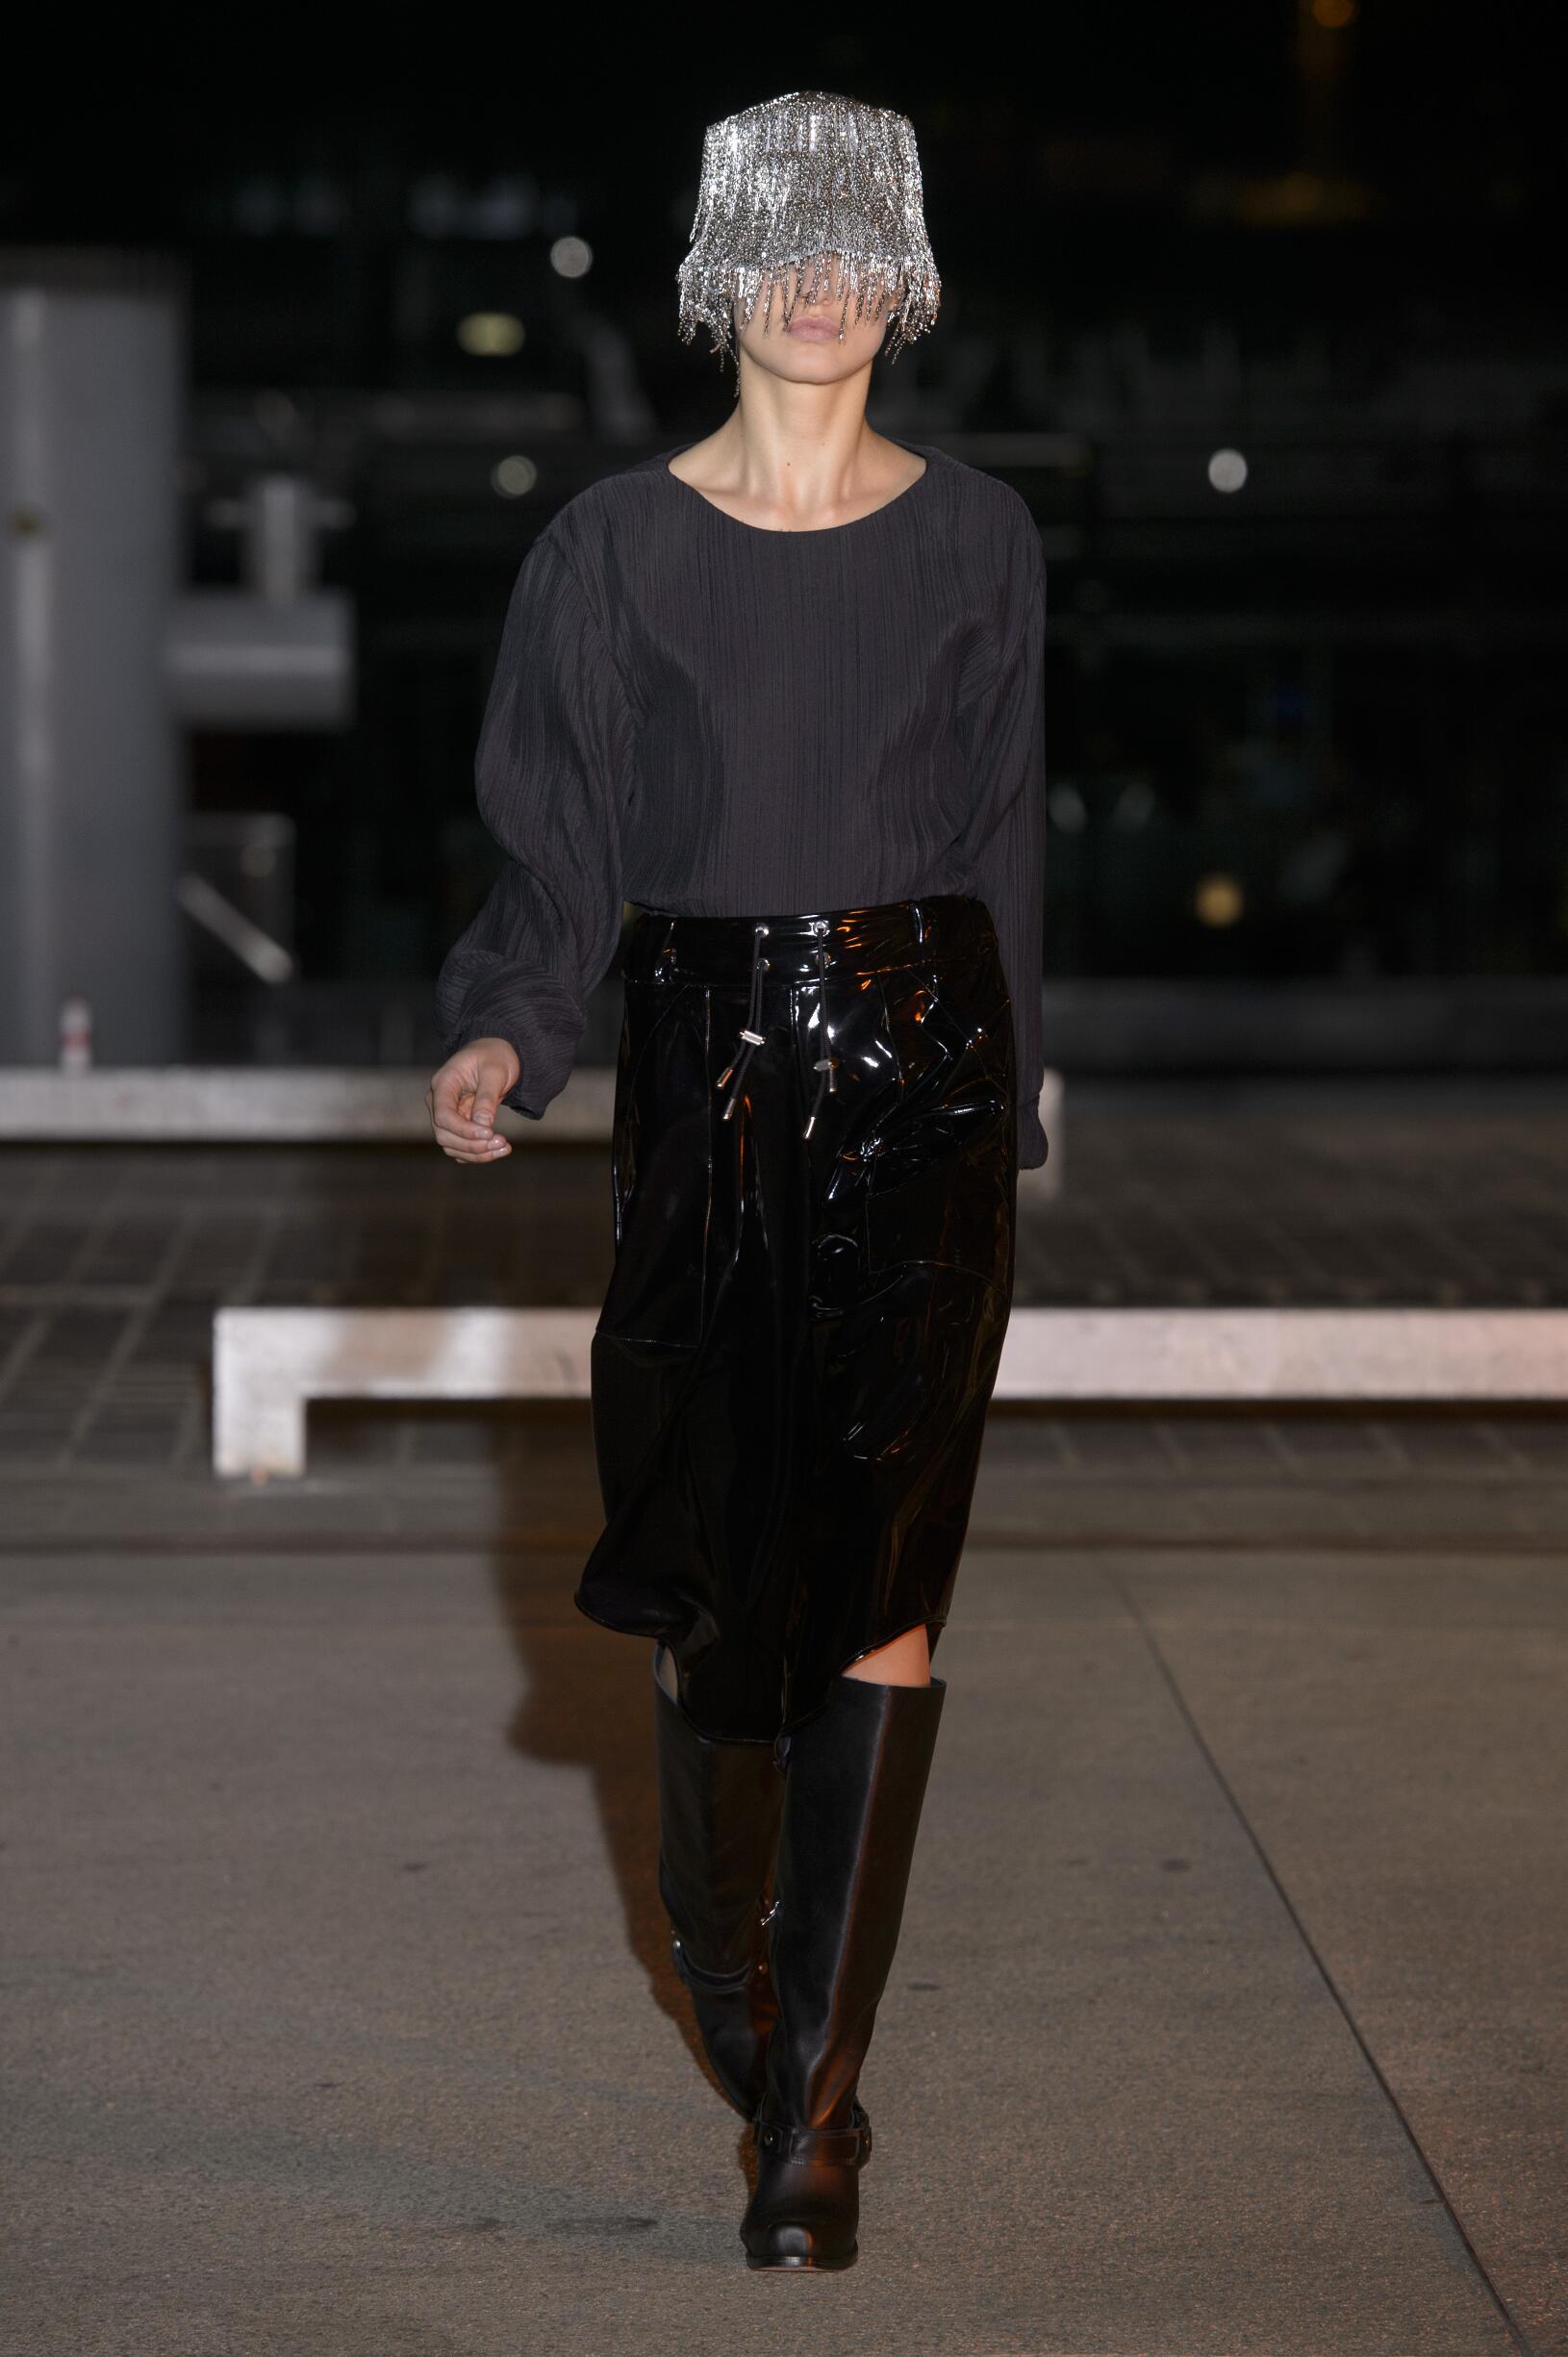 Wanda Nylon Summer 2017 Catwalk